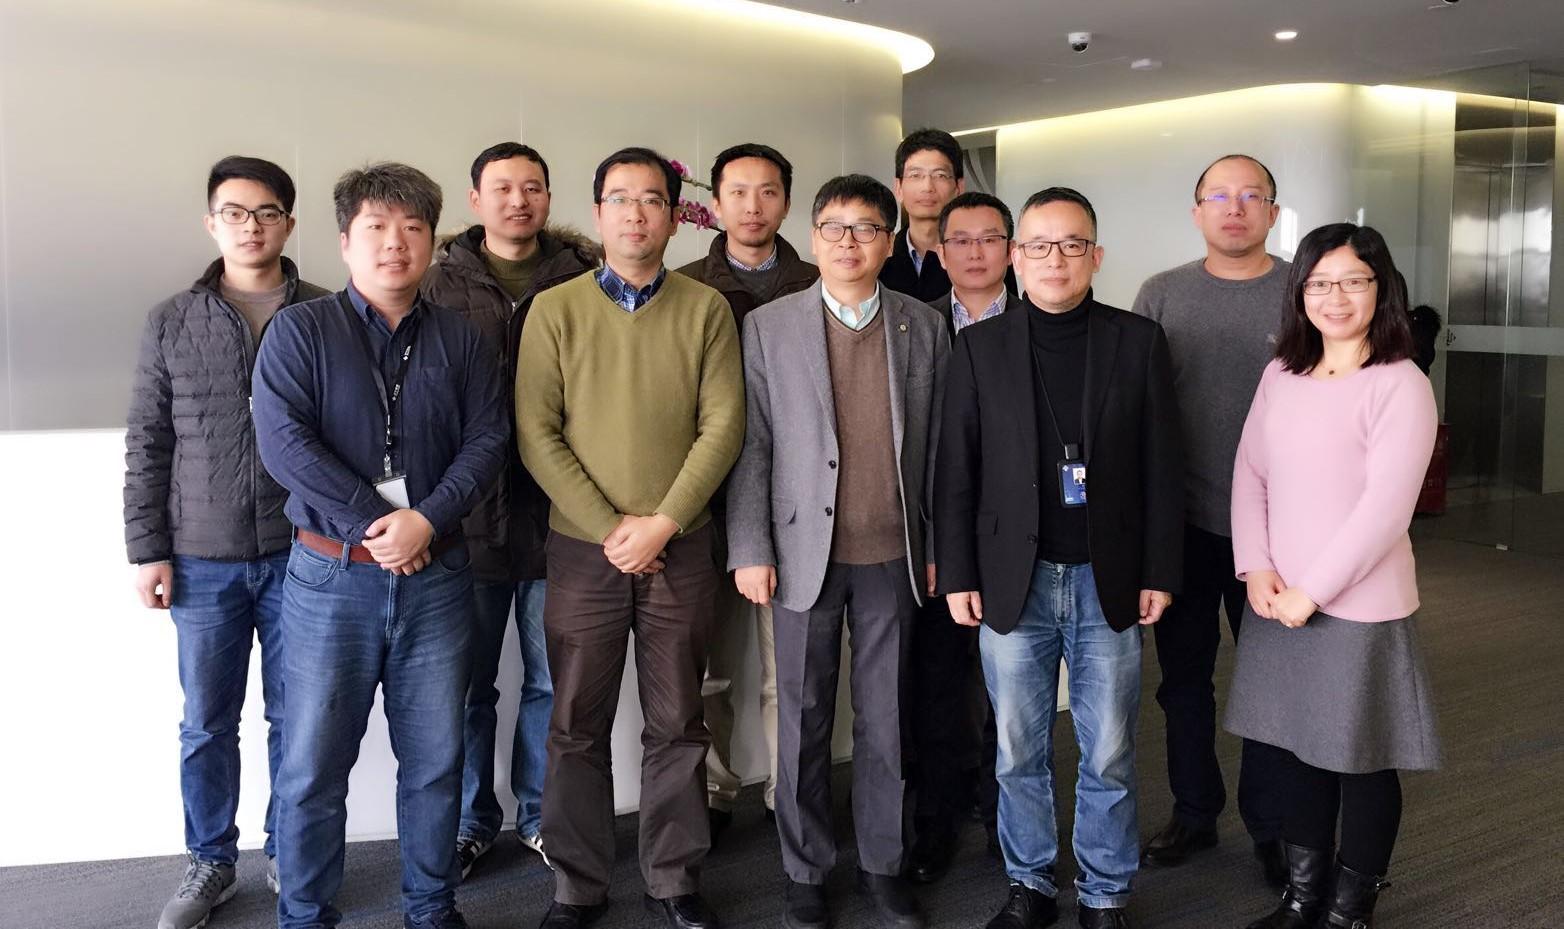 "http://epcc.sjtu.edu.cn/data/upload/过敏意老师带队访问卫宁健康,针对""上海交大-卫宁健康""联合实验室的下一步建设目标进行了研讨,双方期待在大数据相关领域开展更深入的合作。"